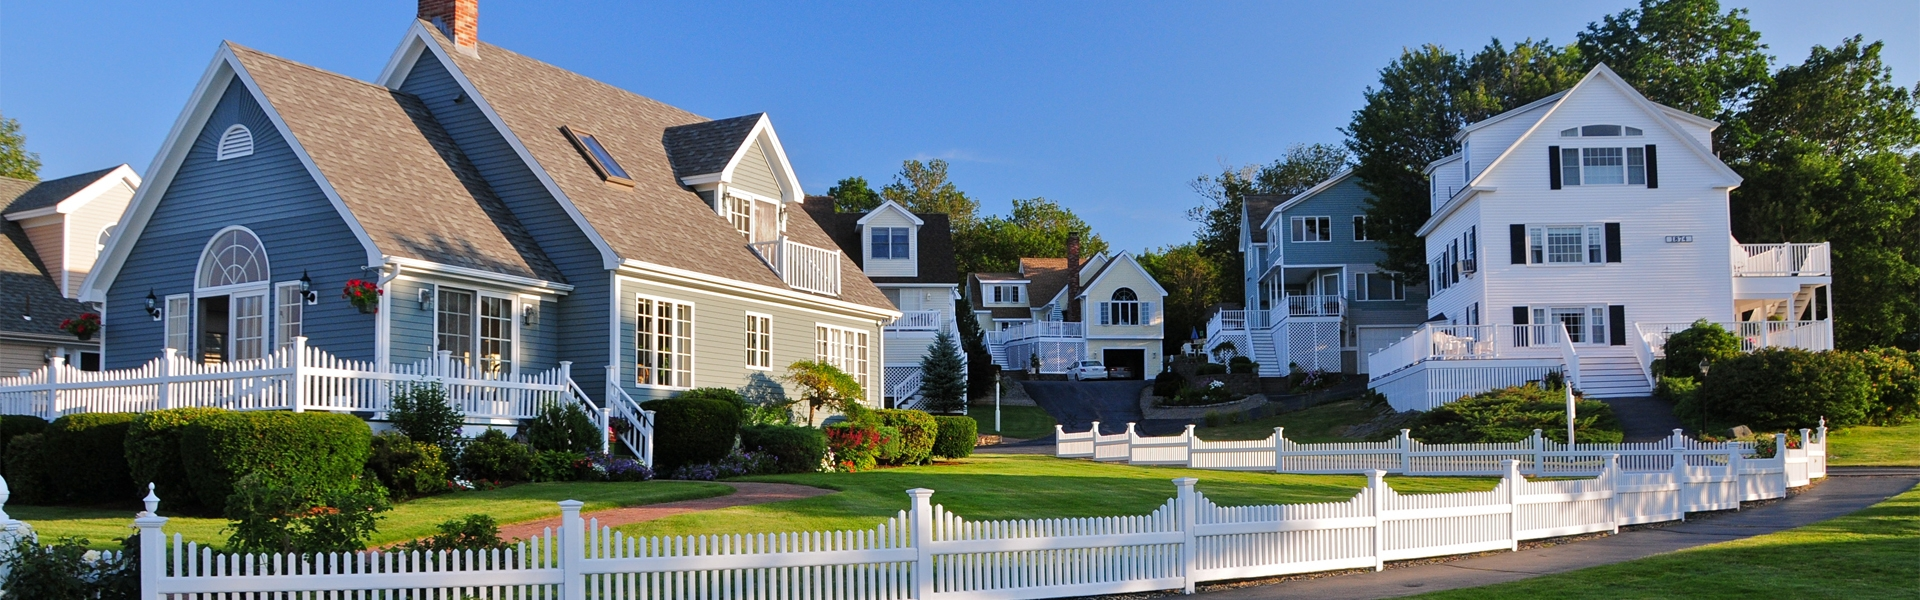 Americay Mortgage Corporation (@americaymortgagecorp) Cover Image